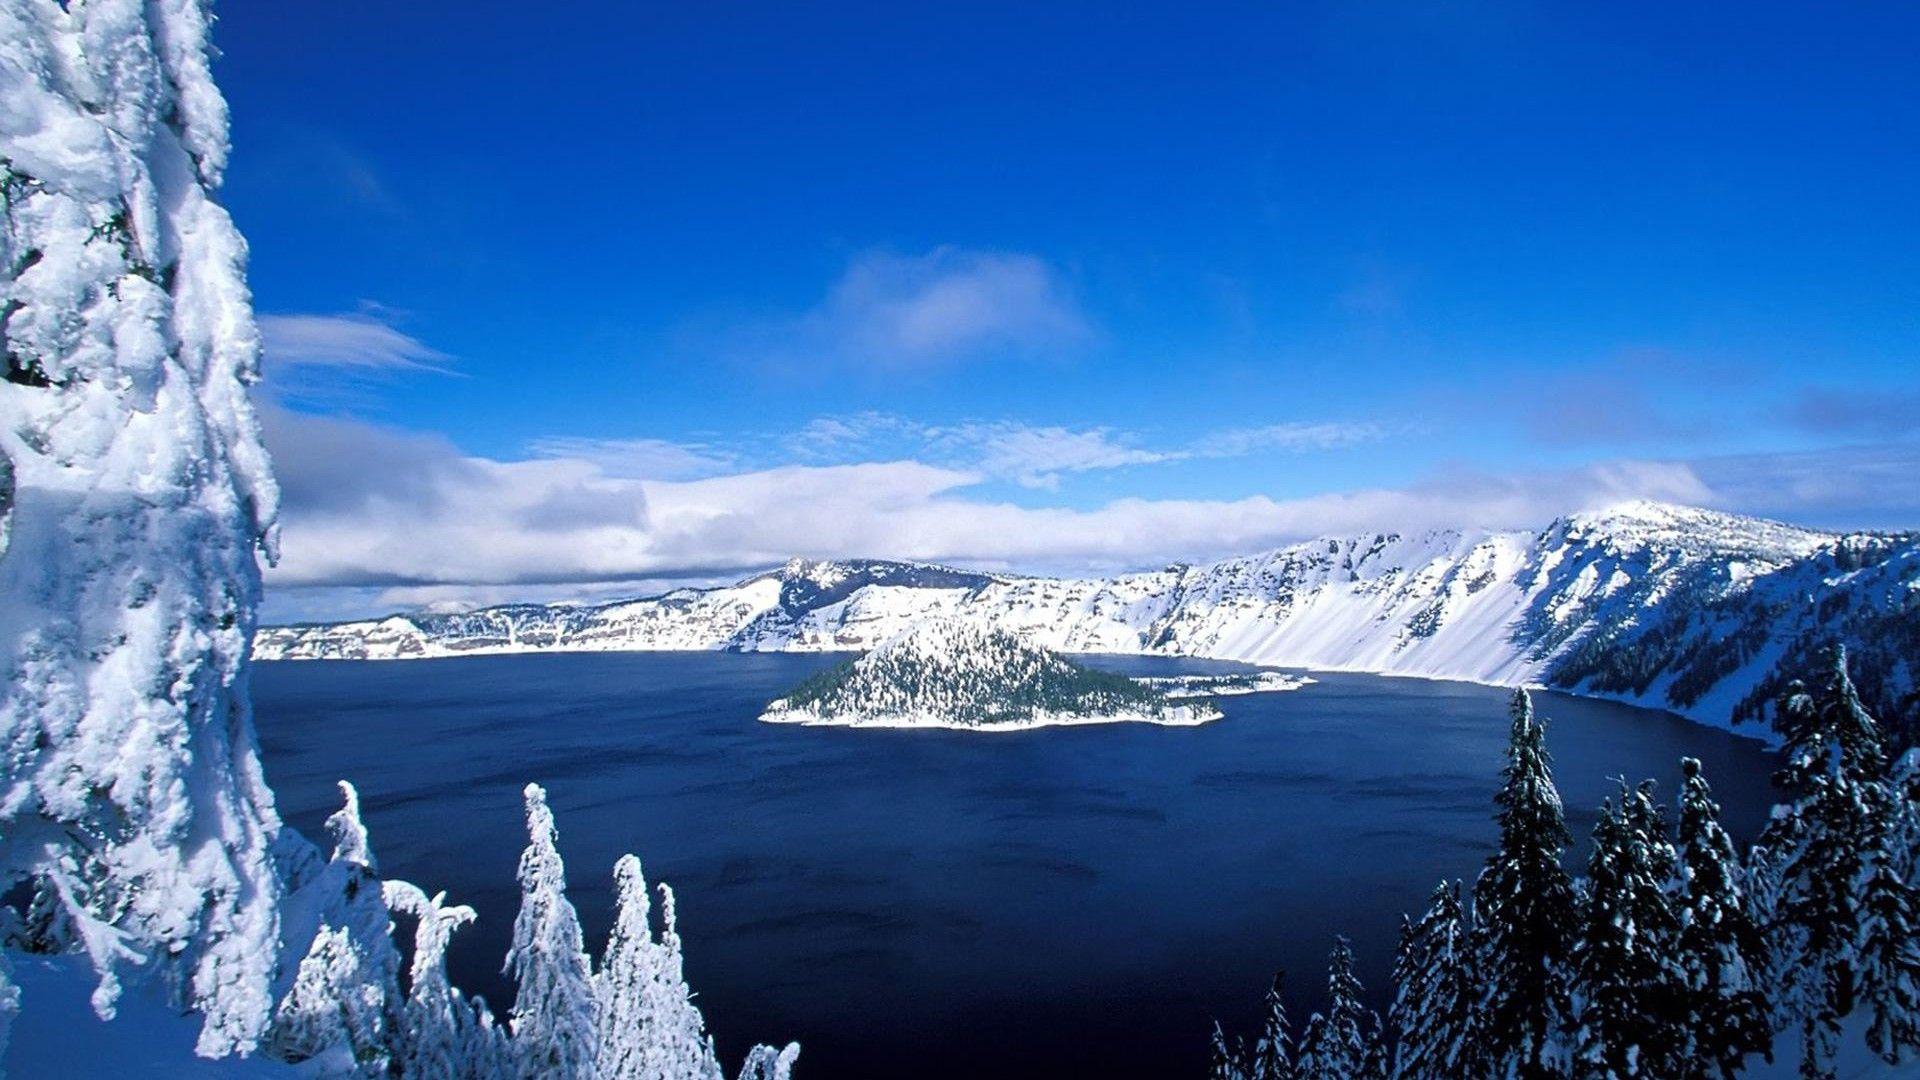 46 1080p winter wallpaper on wallpapersafari - Wallpaper hd nature winter ...